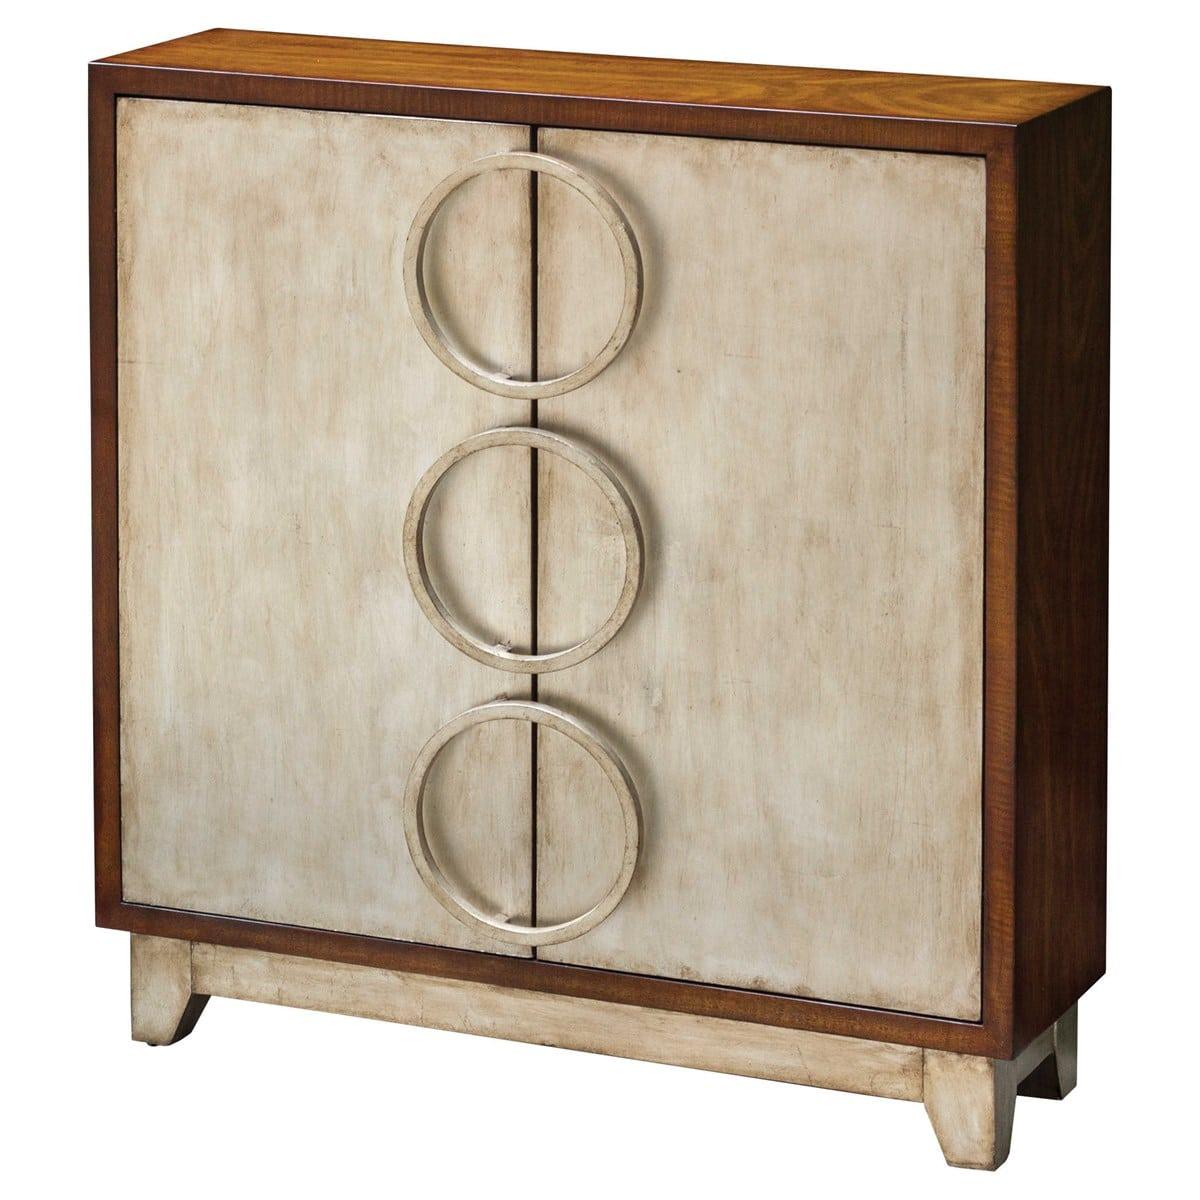 Jacinta 2 Door Cabinet santa barbara design center-